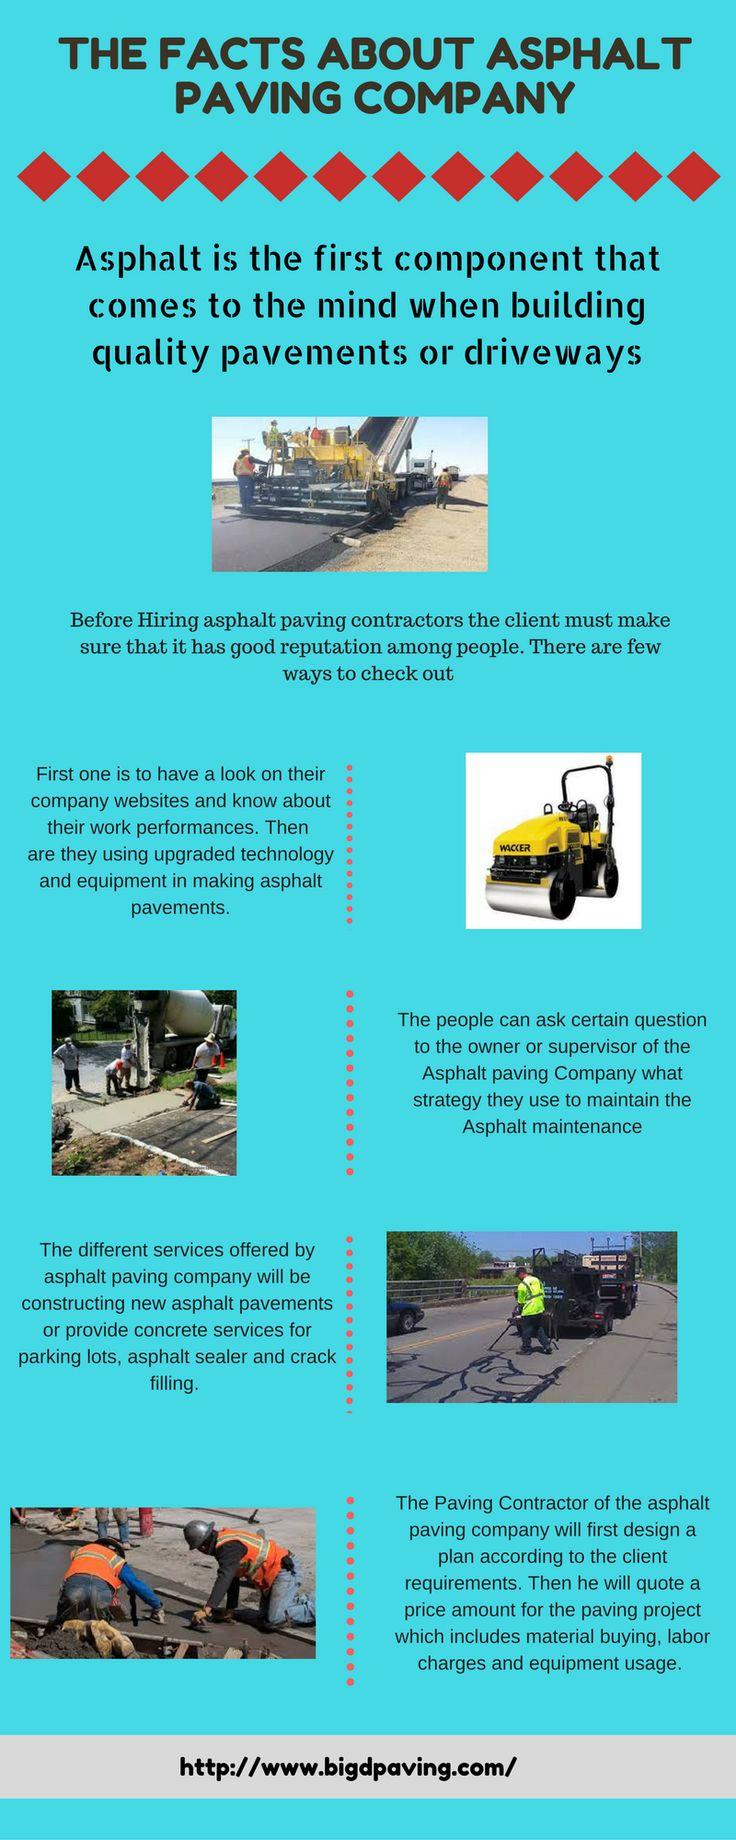 The Facts about Asphalt Paving Company http://www.liveinfographic.com/i/the-facts-about-asphalt-paving-company/ Tags: #infographic  #infographics #popular #pinterest #pinterestinfographics